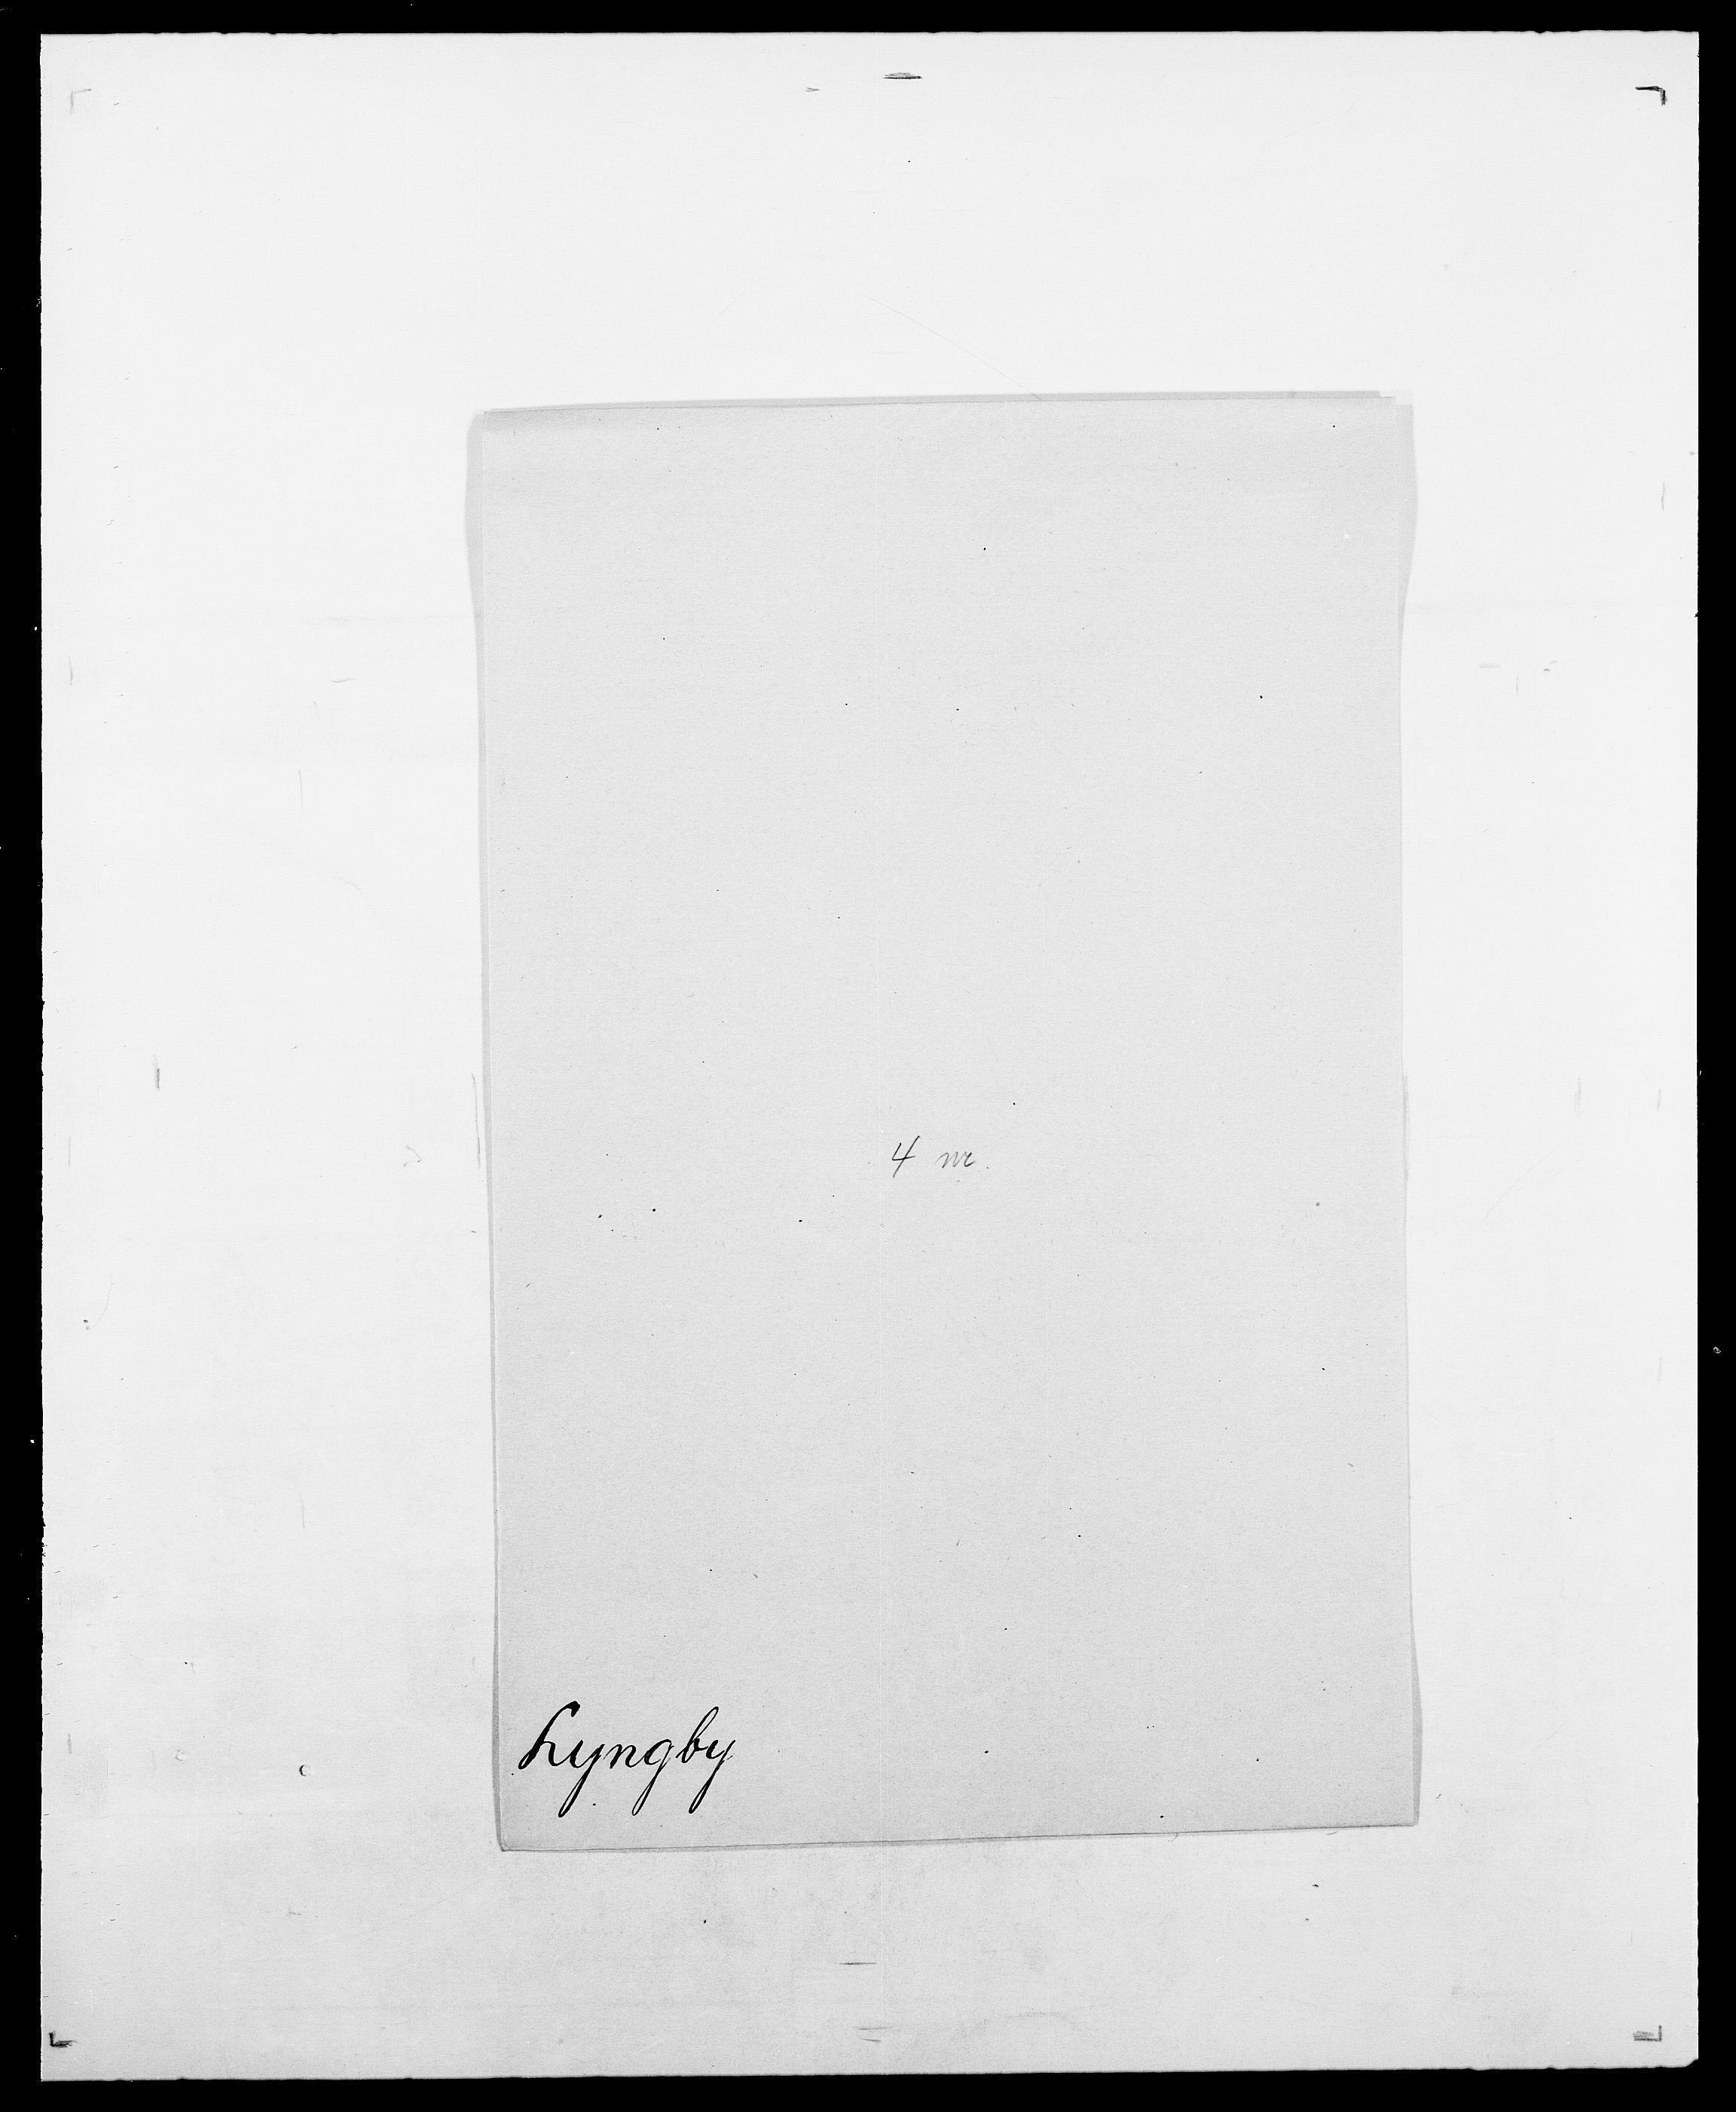 SAO, Delgobe, Charles Antoine - samling, D/Da/L0024: Lobech - Lærum, s. 740